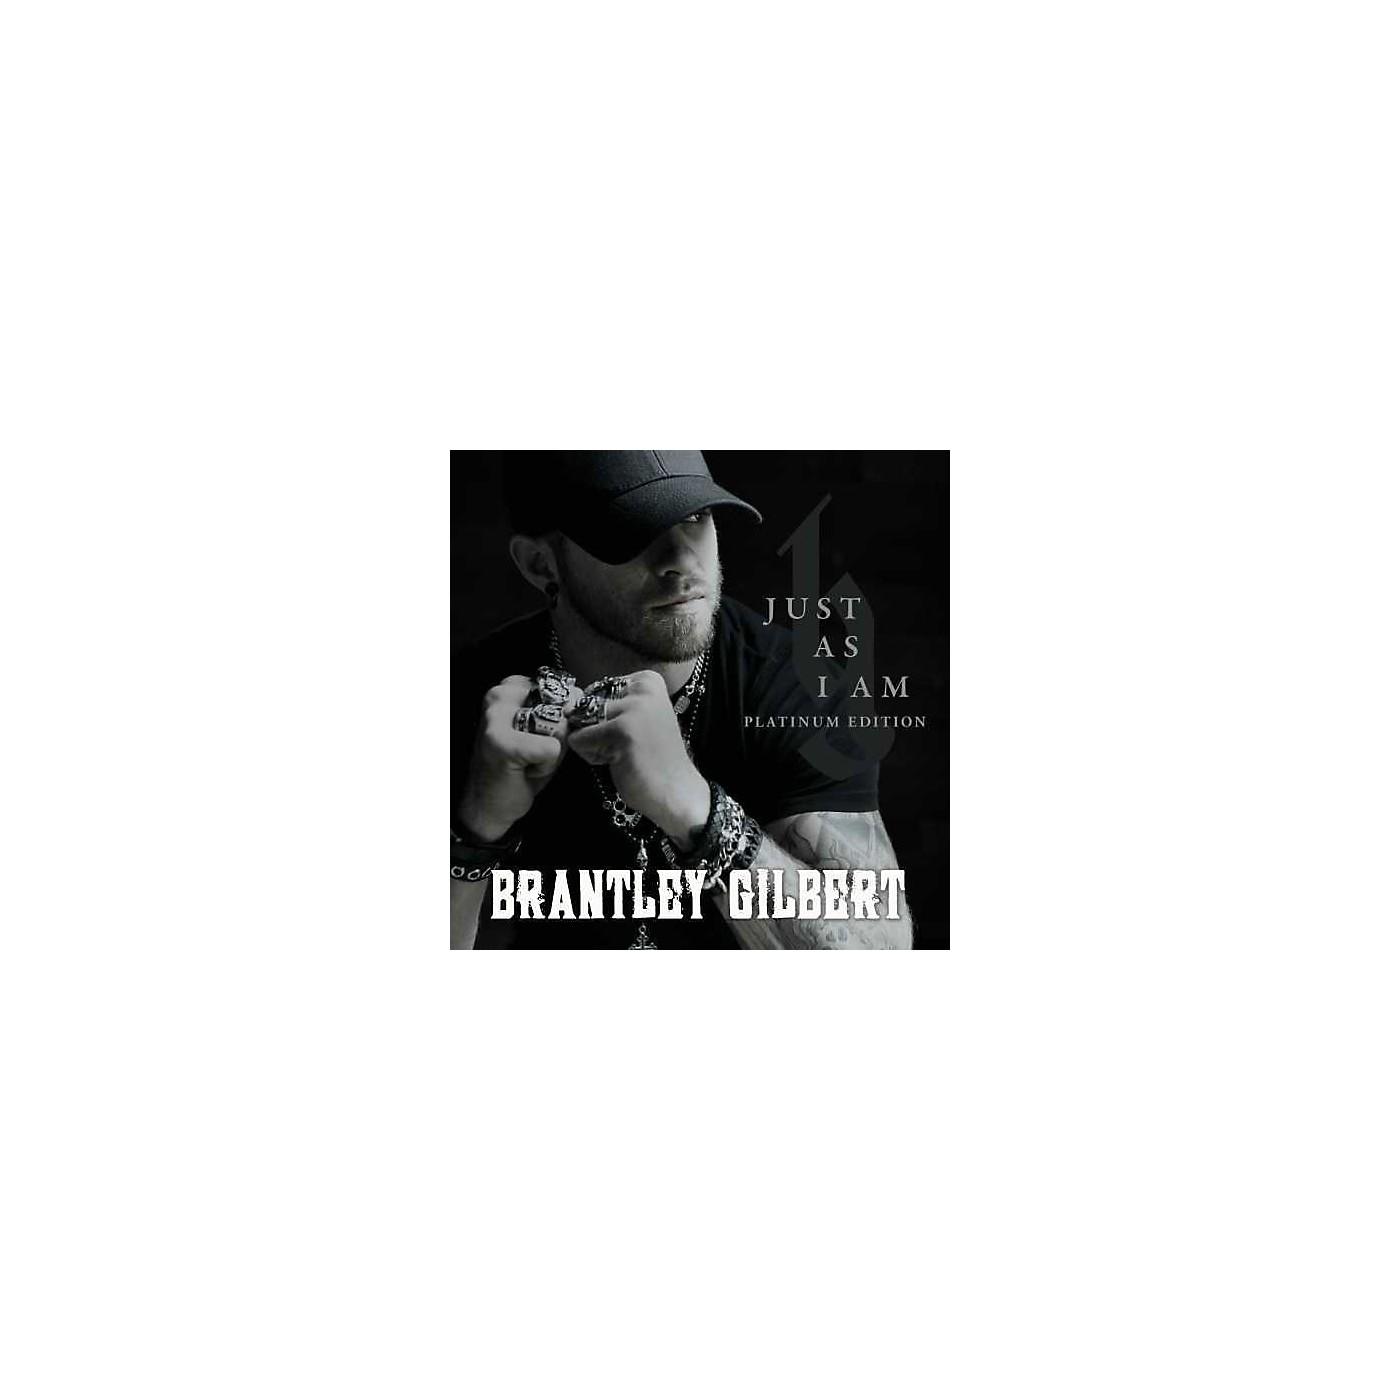 Alliance Brantley Gilbert - Just As I Am Platium Edition thumbnail